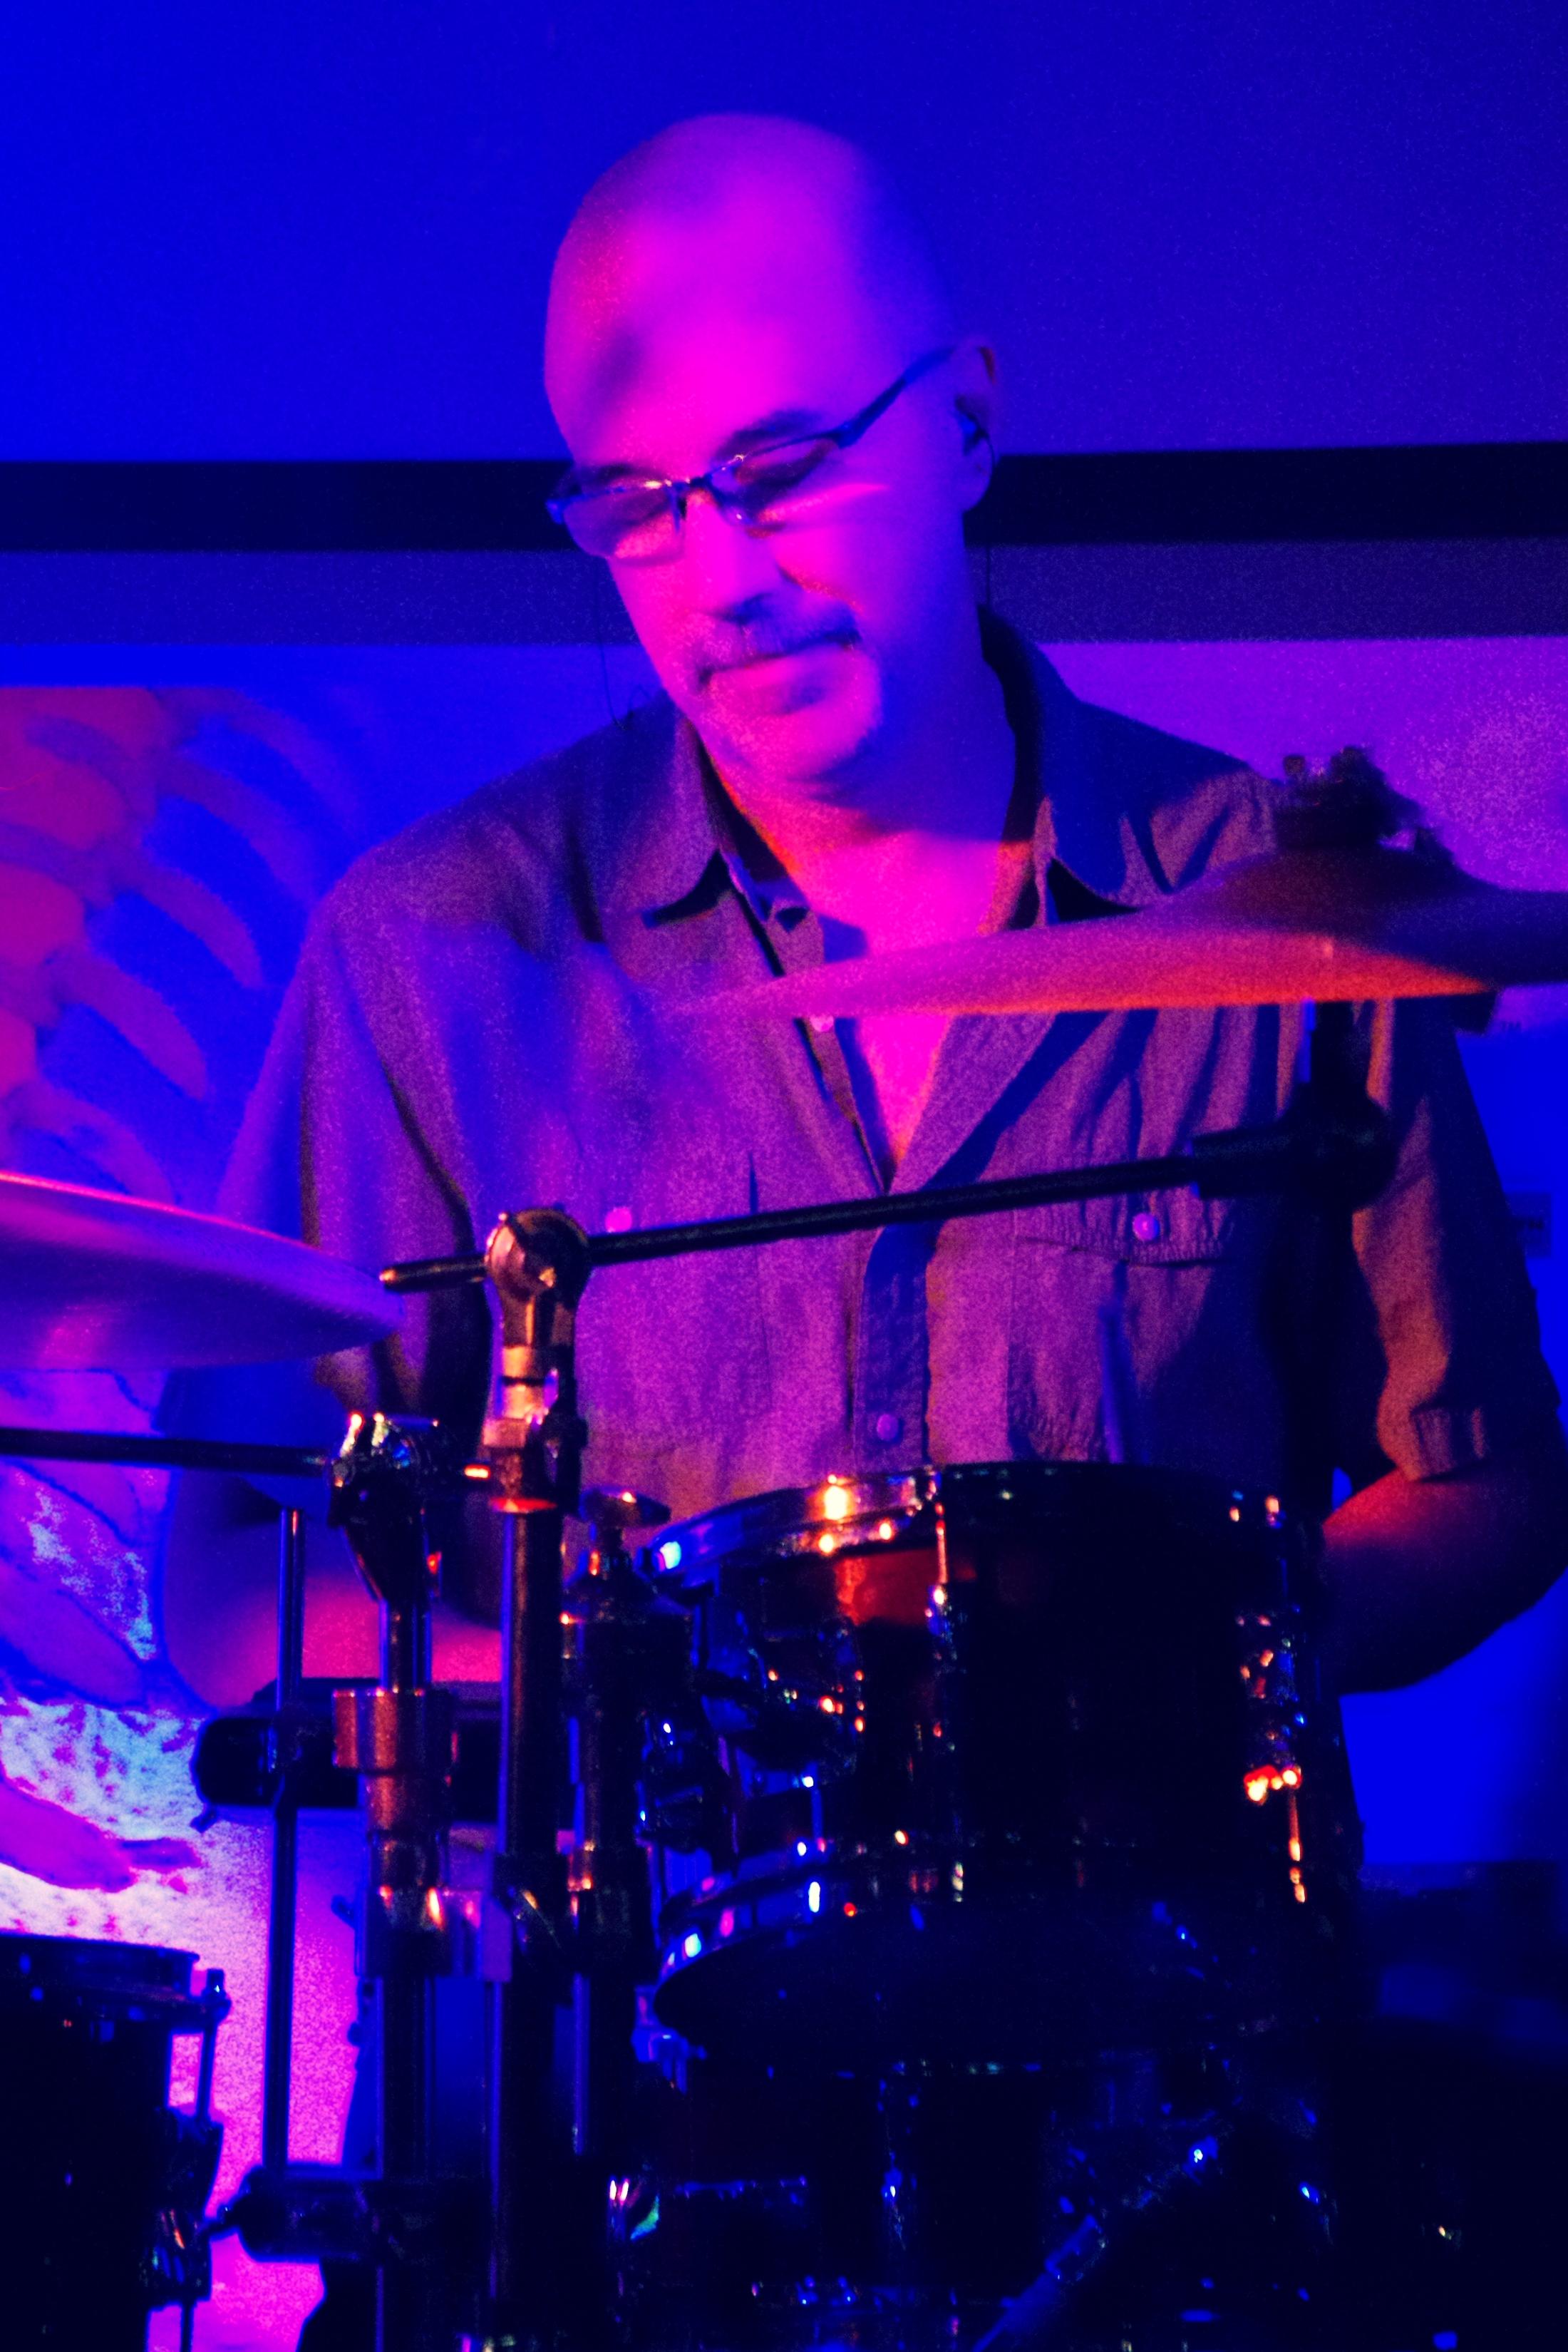 Eric Willhelm - Drums & Vocals